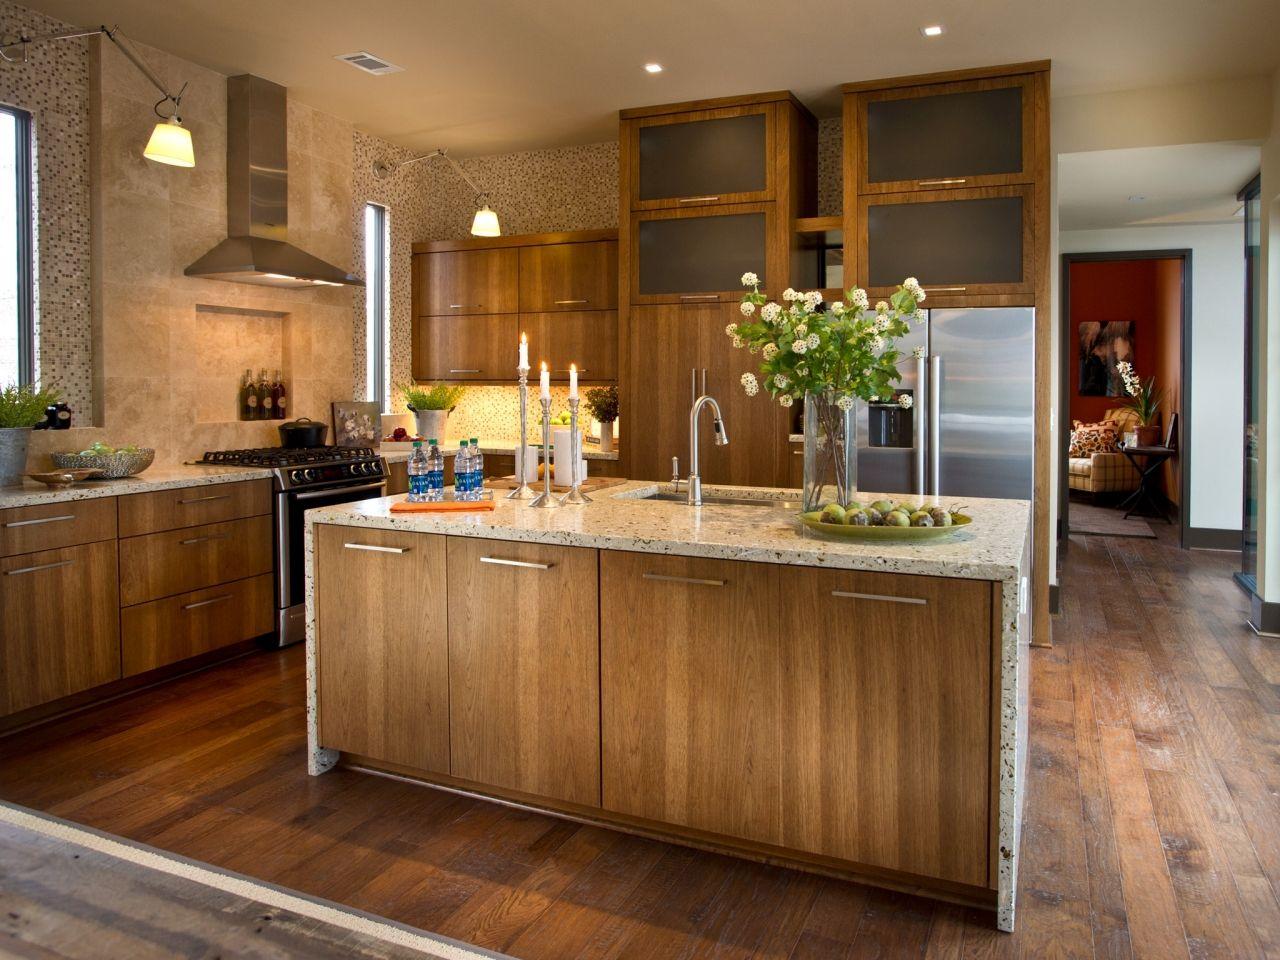 Custom Kitchen Designer Captivating ये 11 टिप्स किचन में करेंगे आपका काम Inspiration